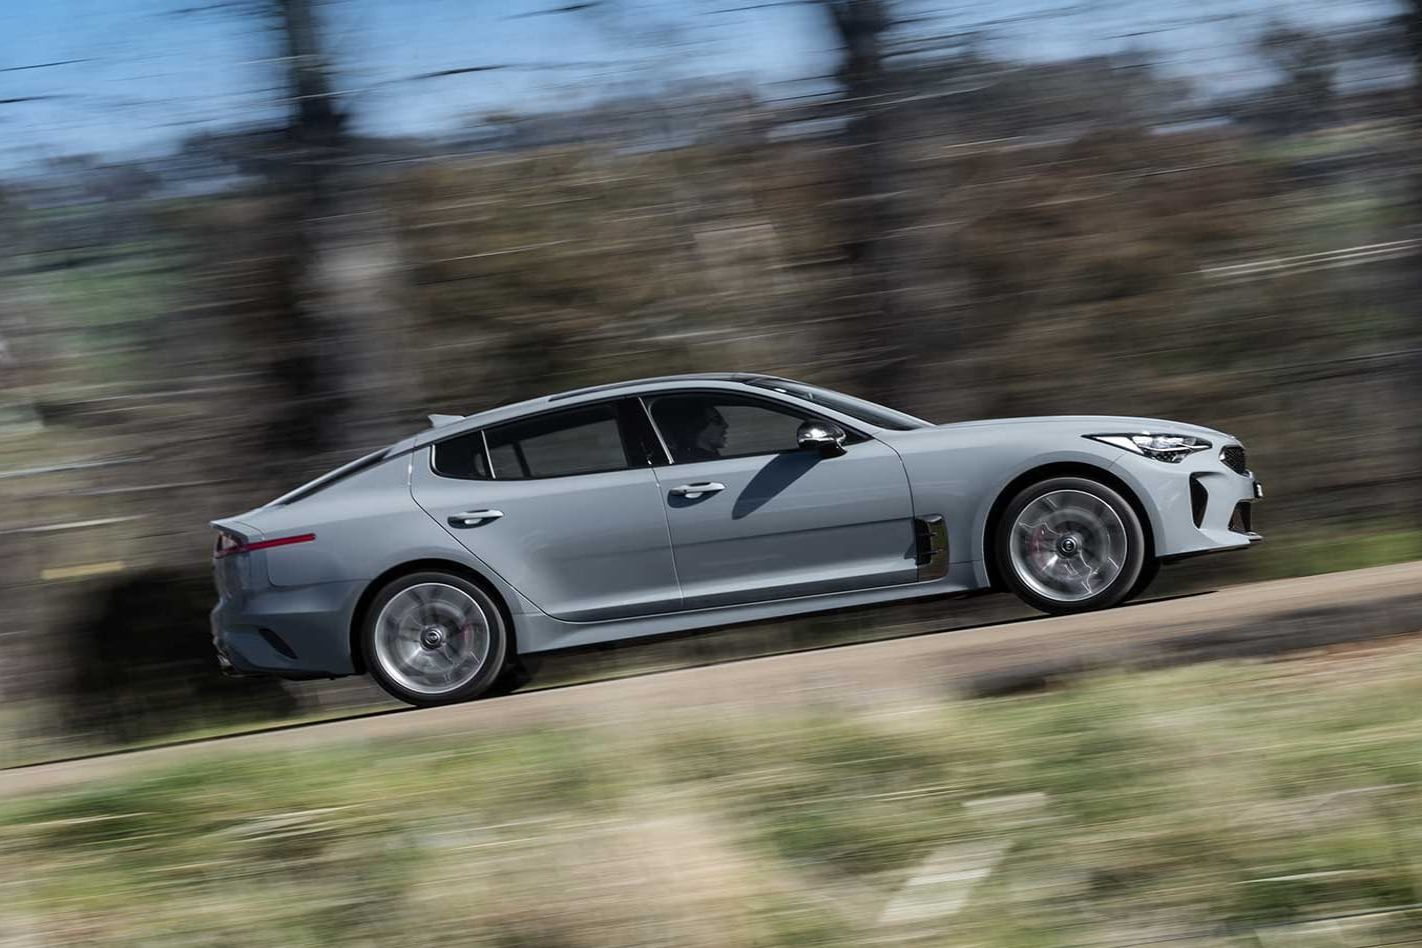 2019 Kia Stinger GT quick performance review